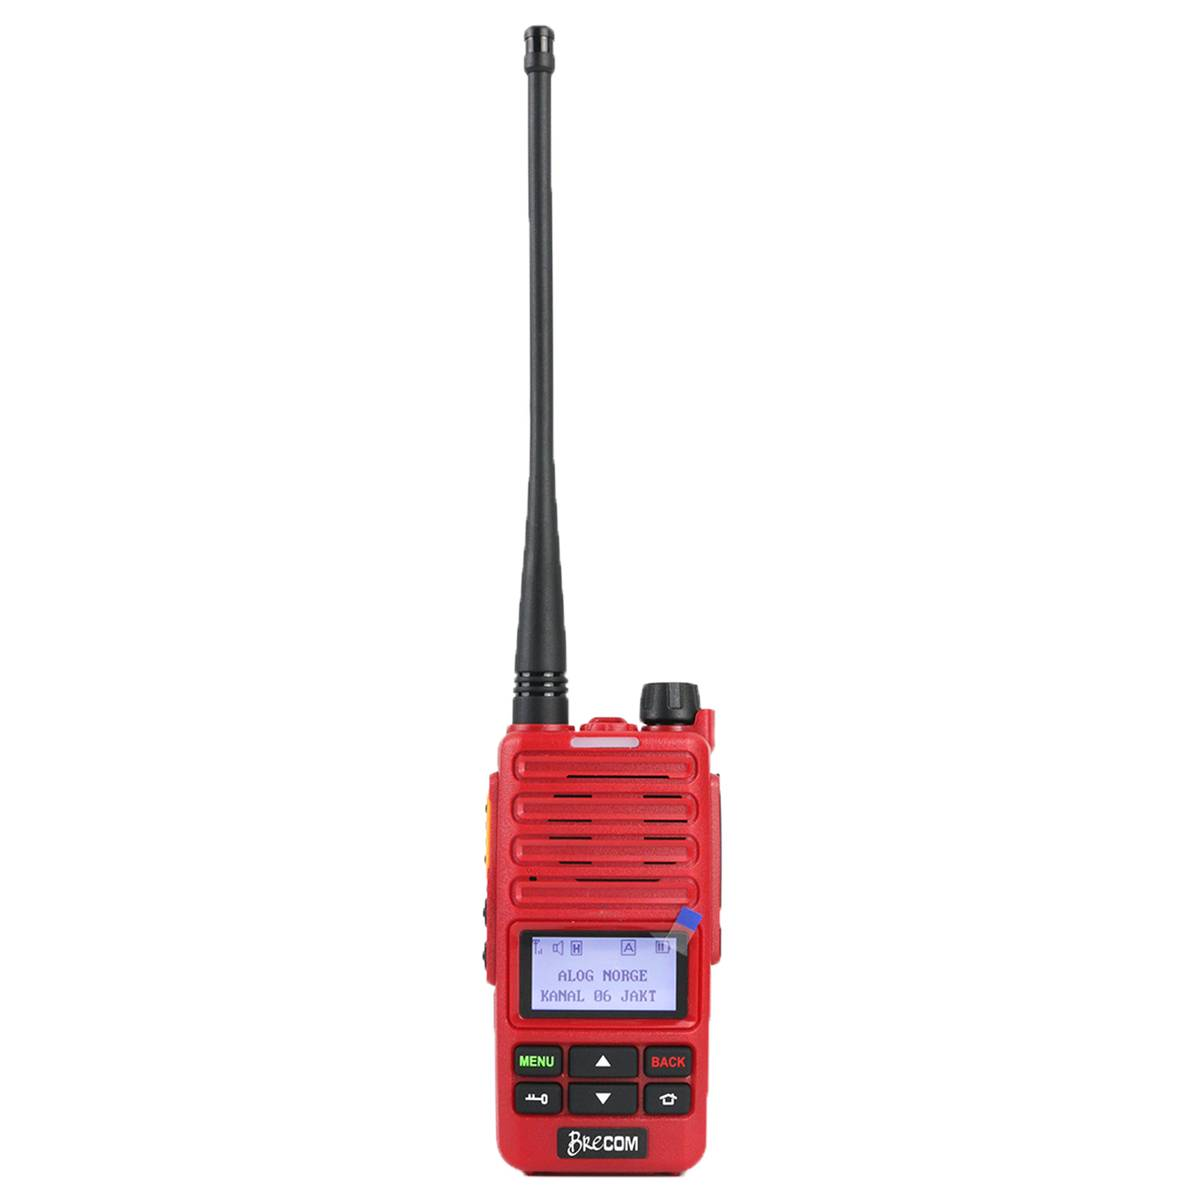 10070000- -Brecom VR-600D analog/digital radio DMR 138-174Mhz